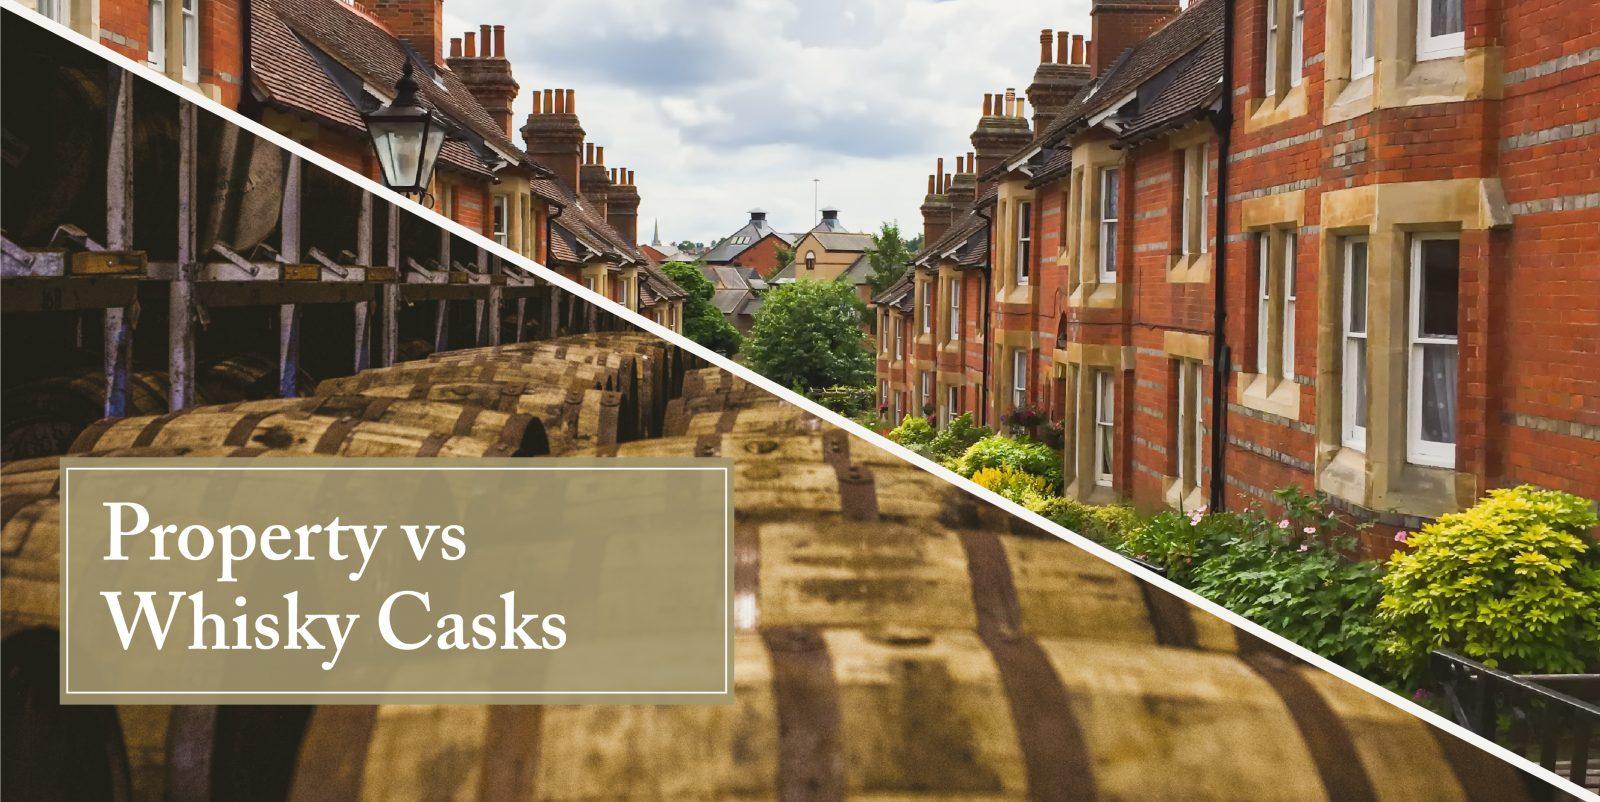 Whisky cask investment vs. property